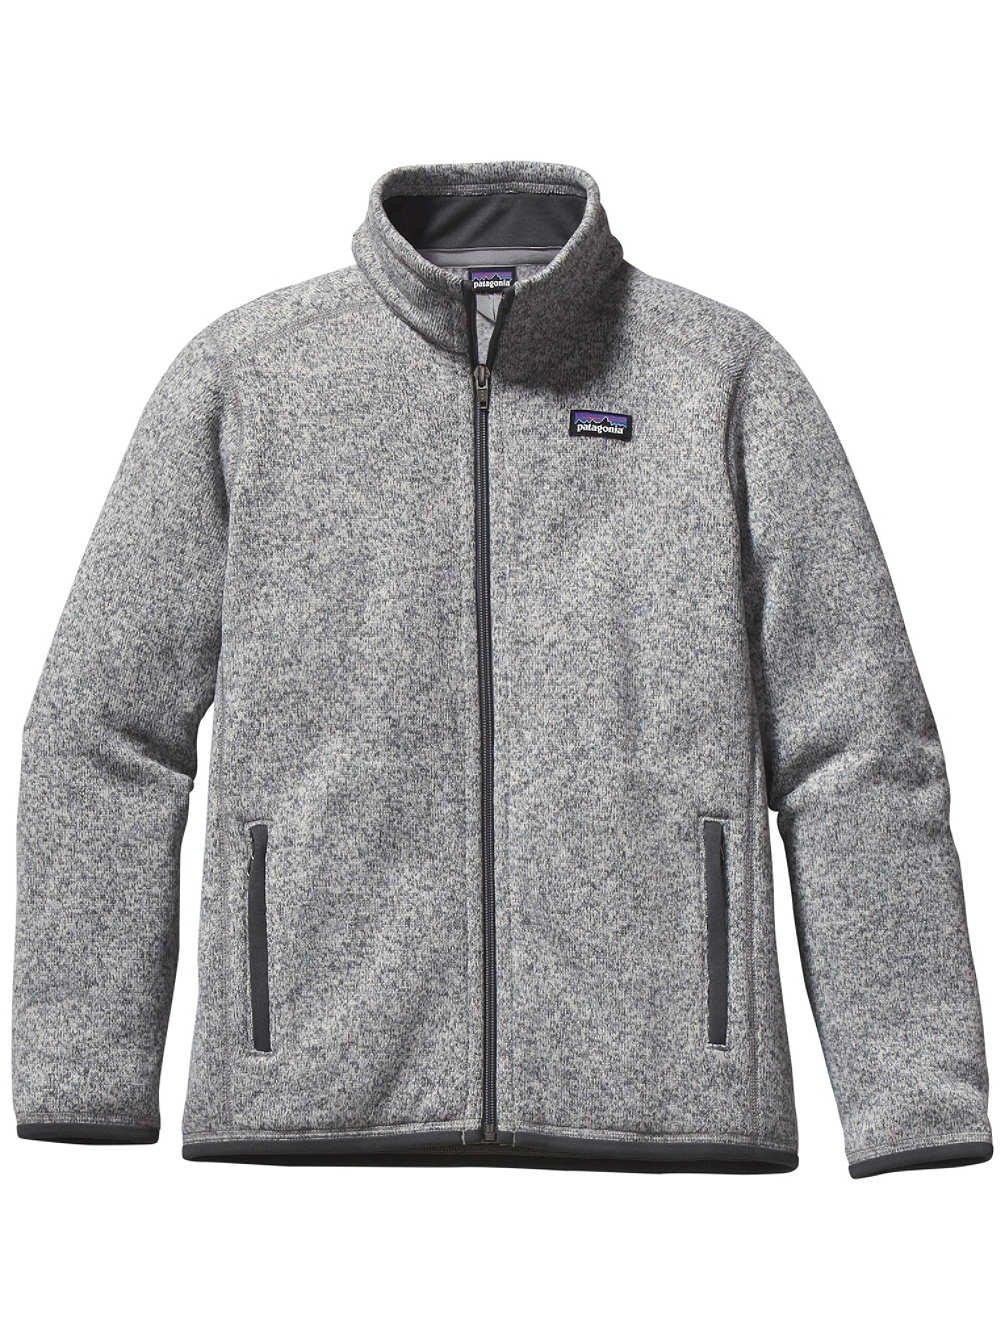 Patagonia Better Sweater Fleece Jacket - Boys' Stonewash